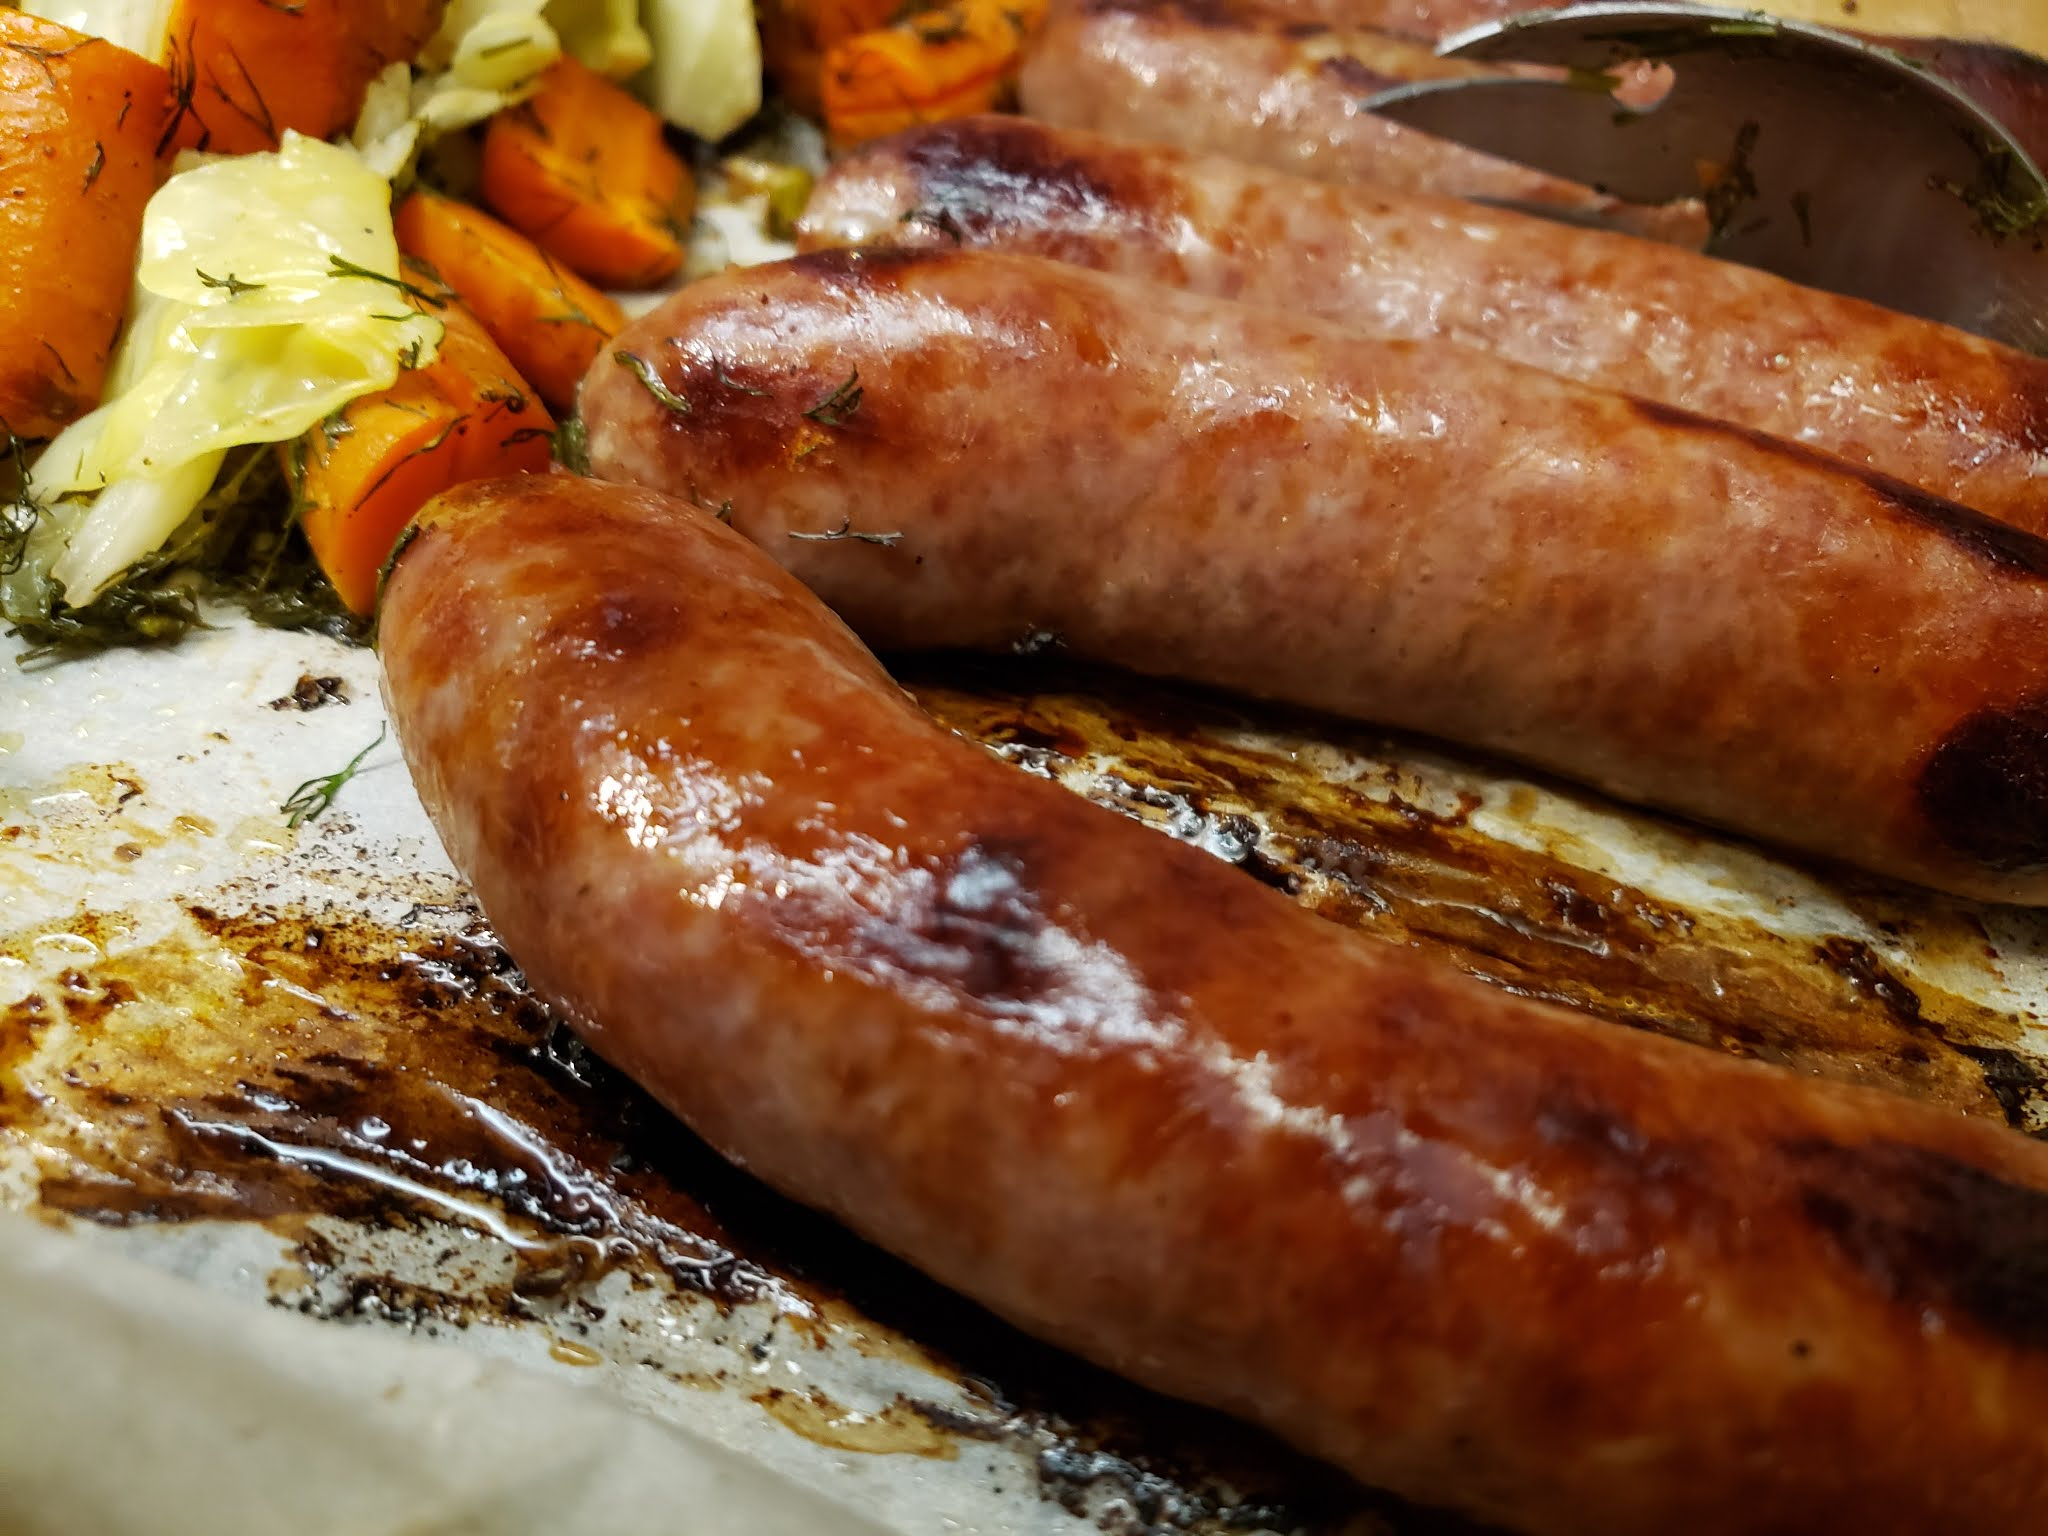 Sheet Pan Sausage And Carrots